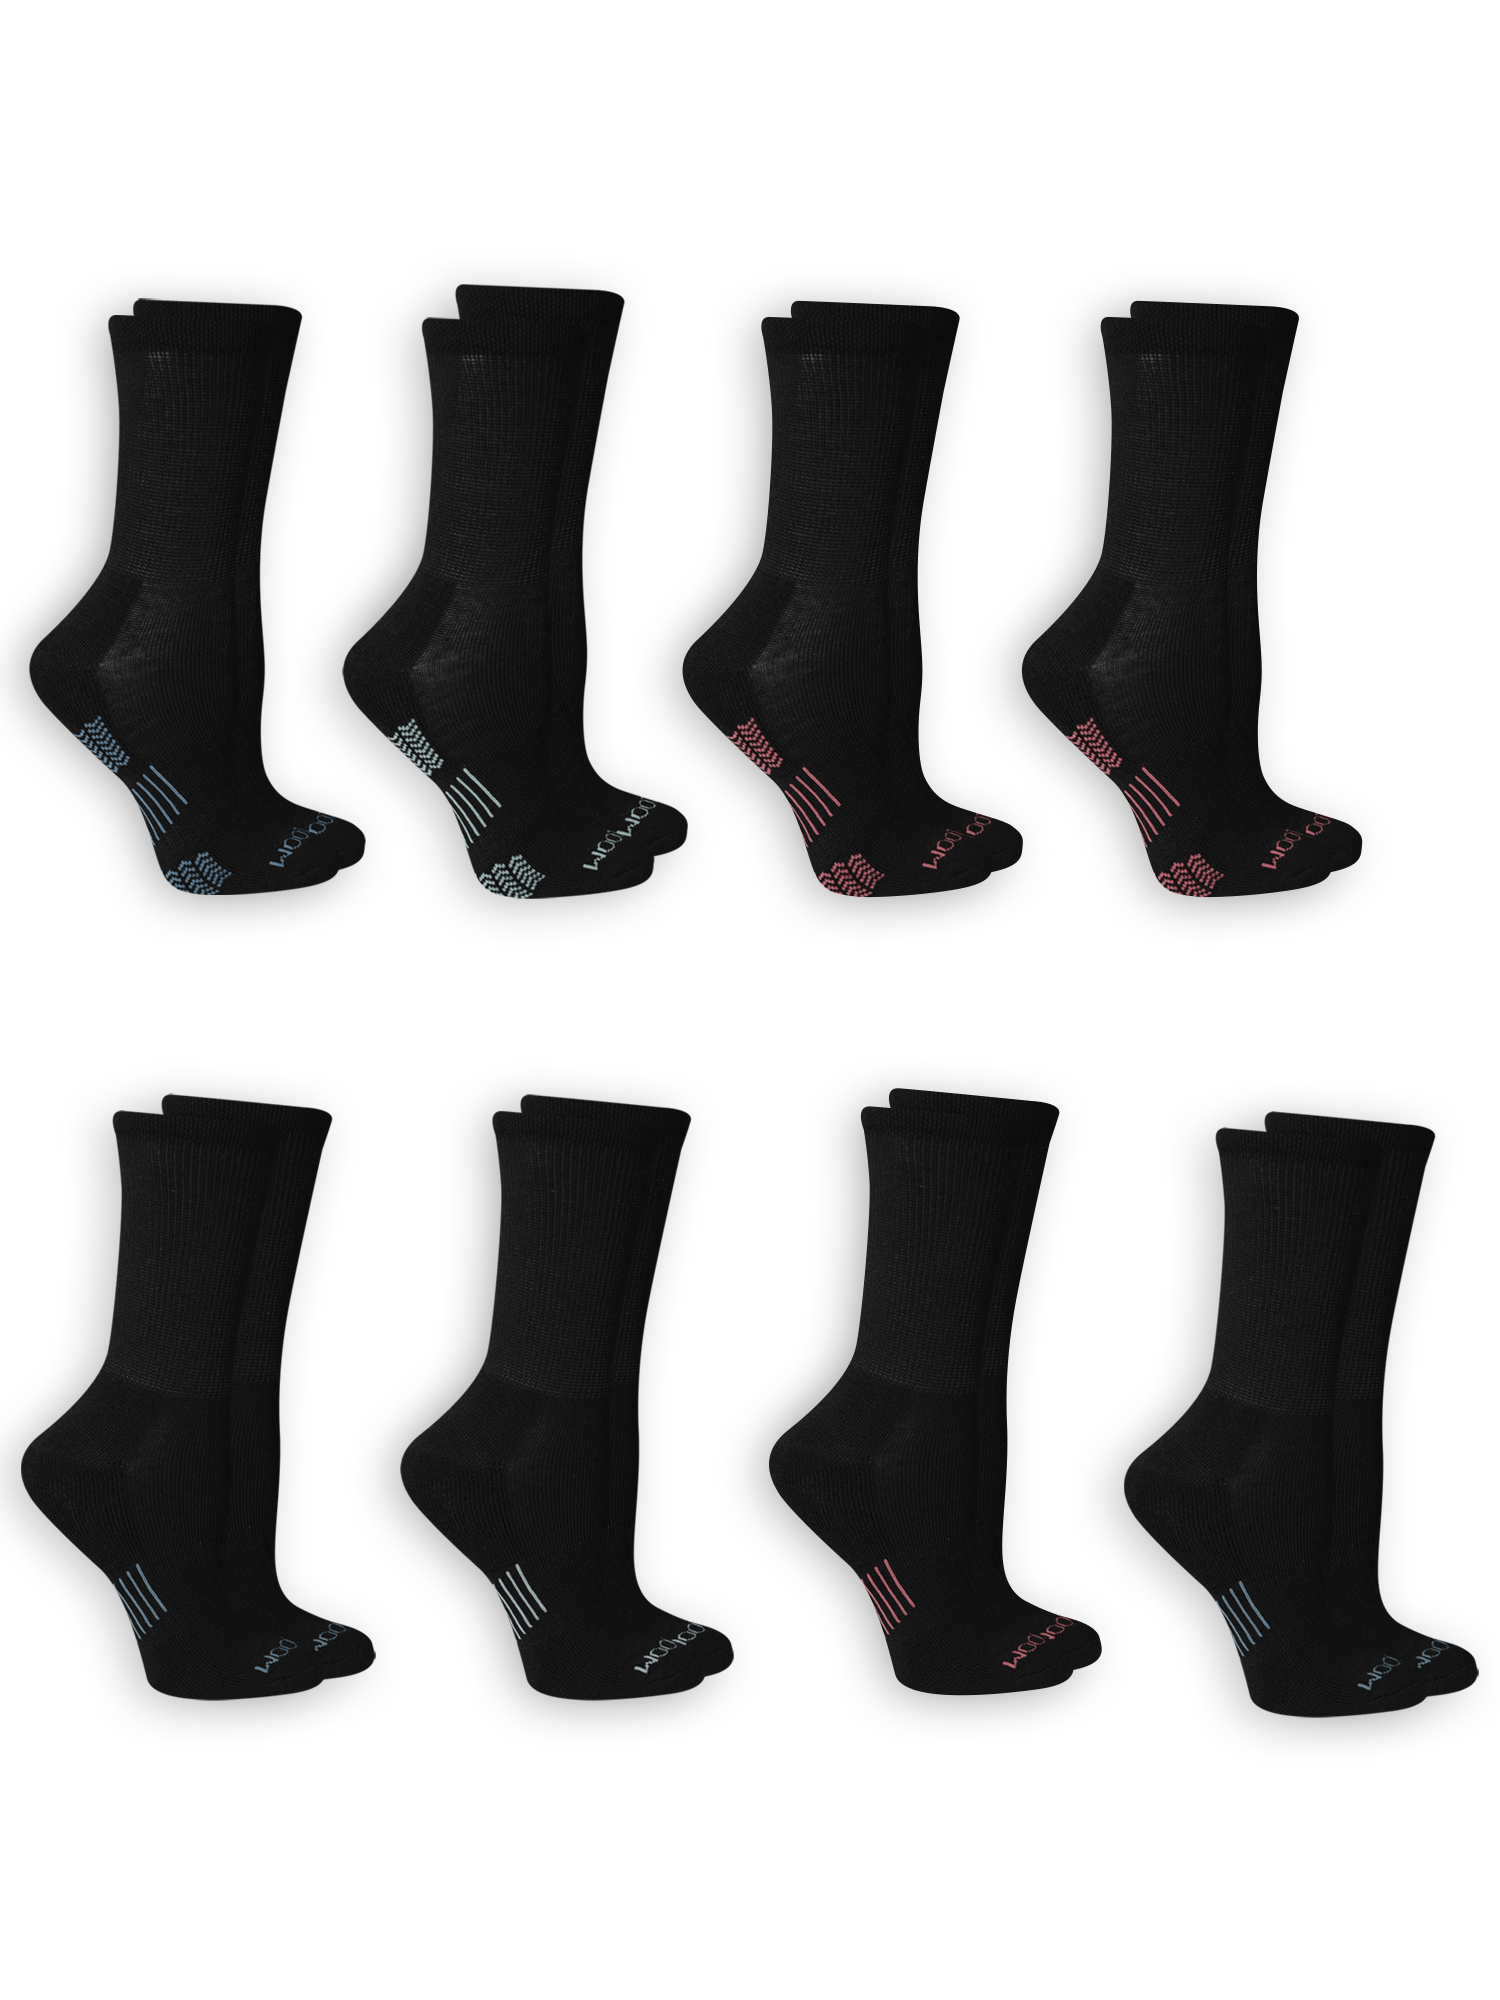 Women's Everyday Active Cushioned Crew Socks 8 Pair